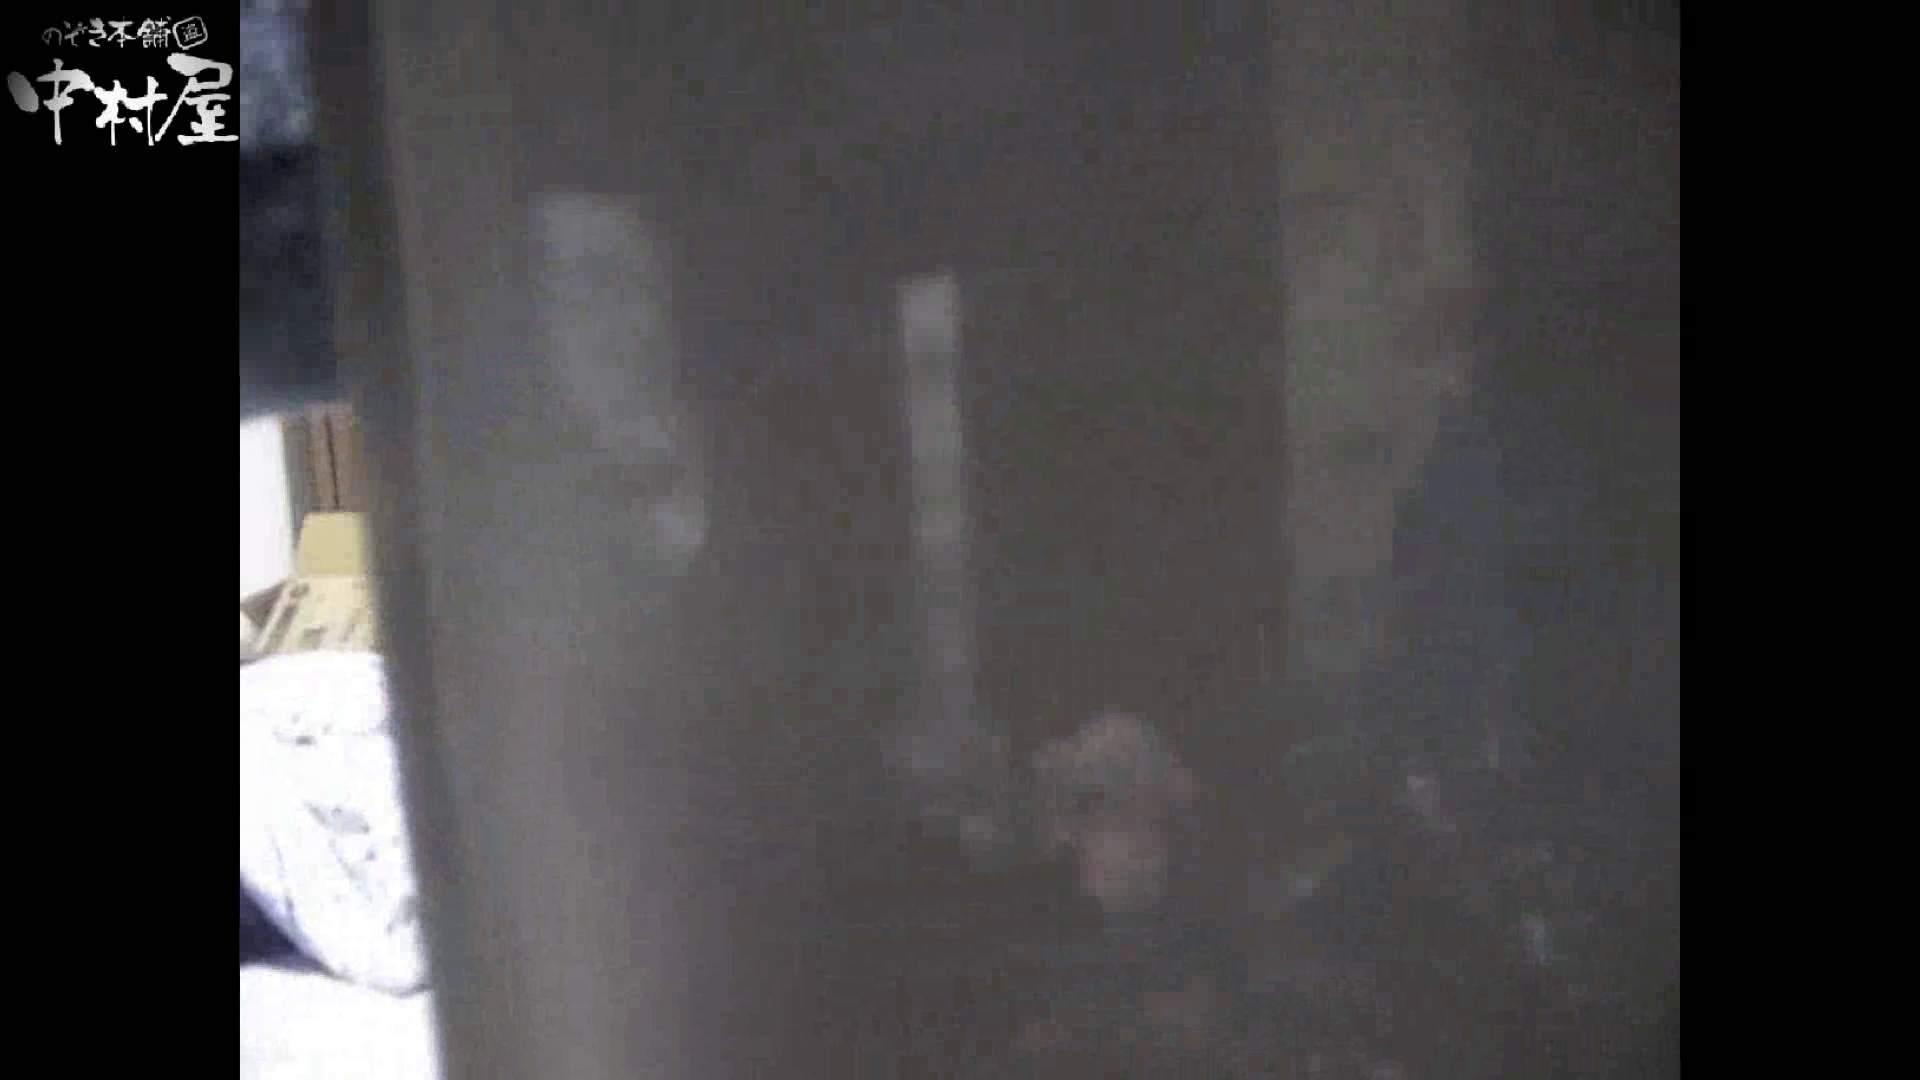 民家風呂専門盗撮師の超危険映像 vol.021 エロい美少女  85PIX 70